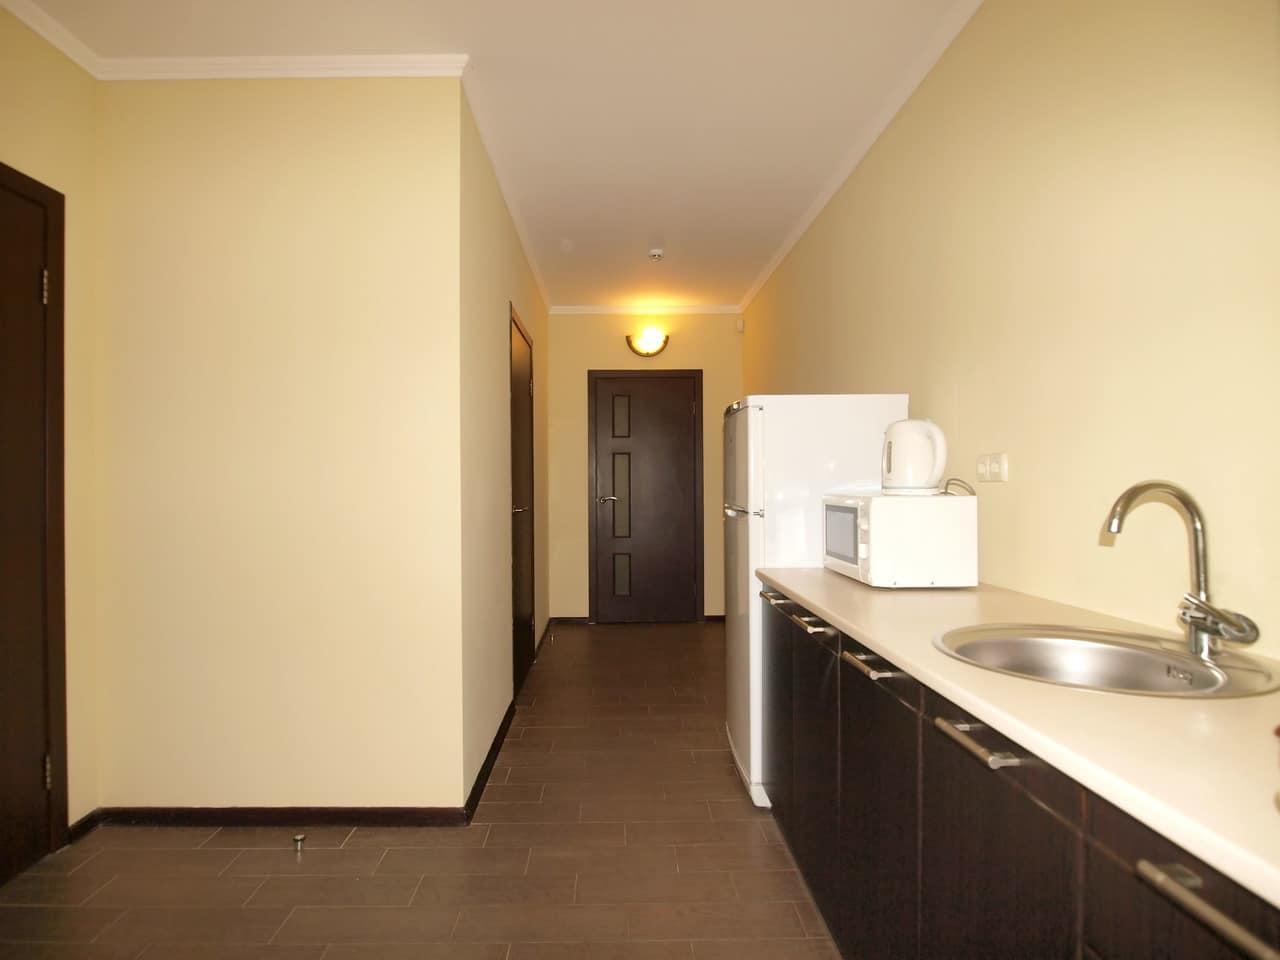 Люкс-улучшенный 4-х местный двухкомнатный. Кухня